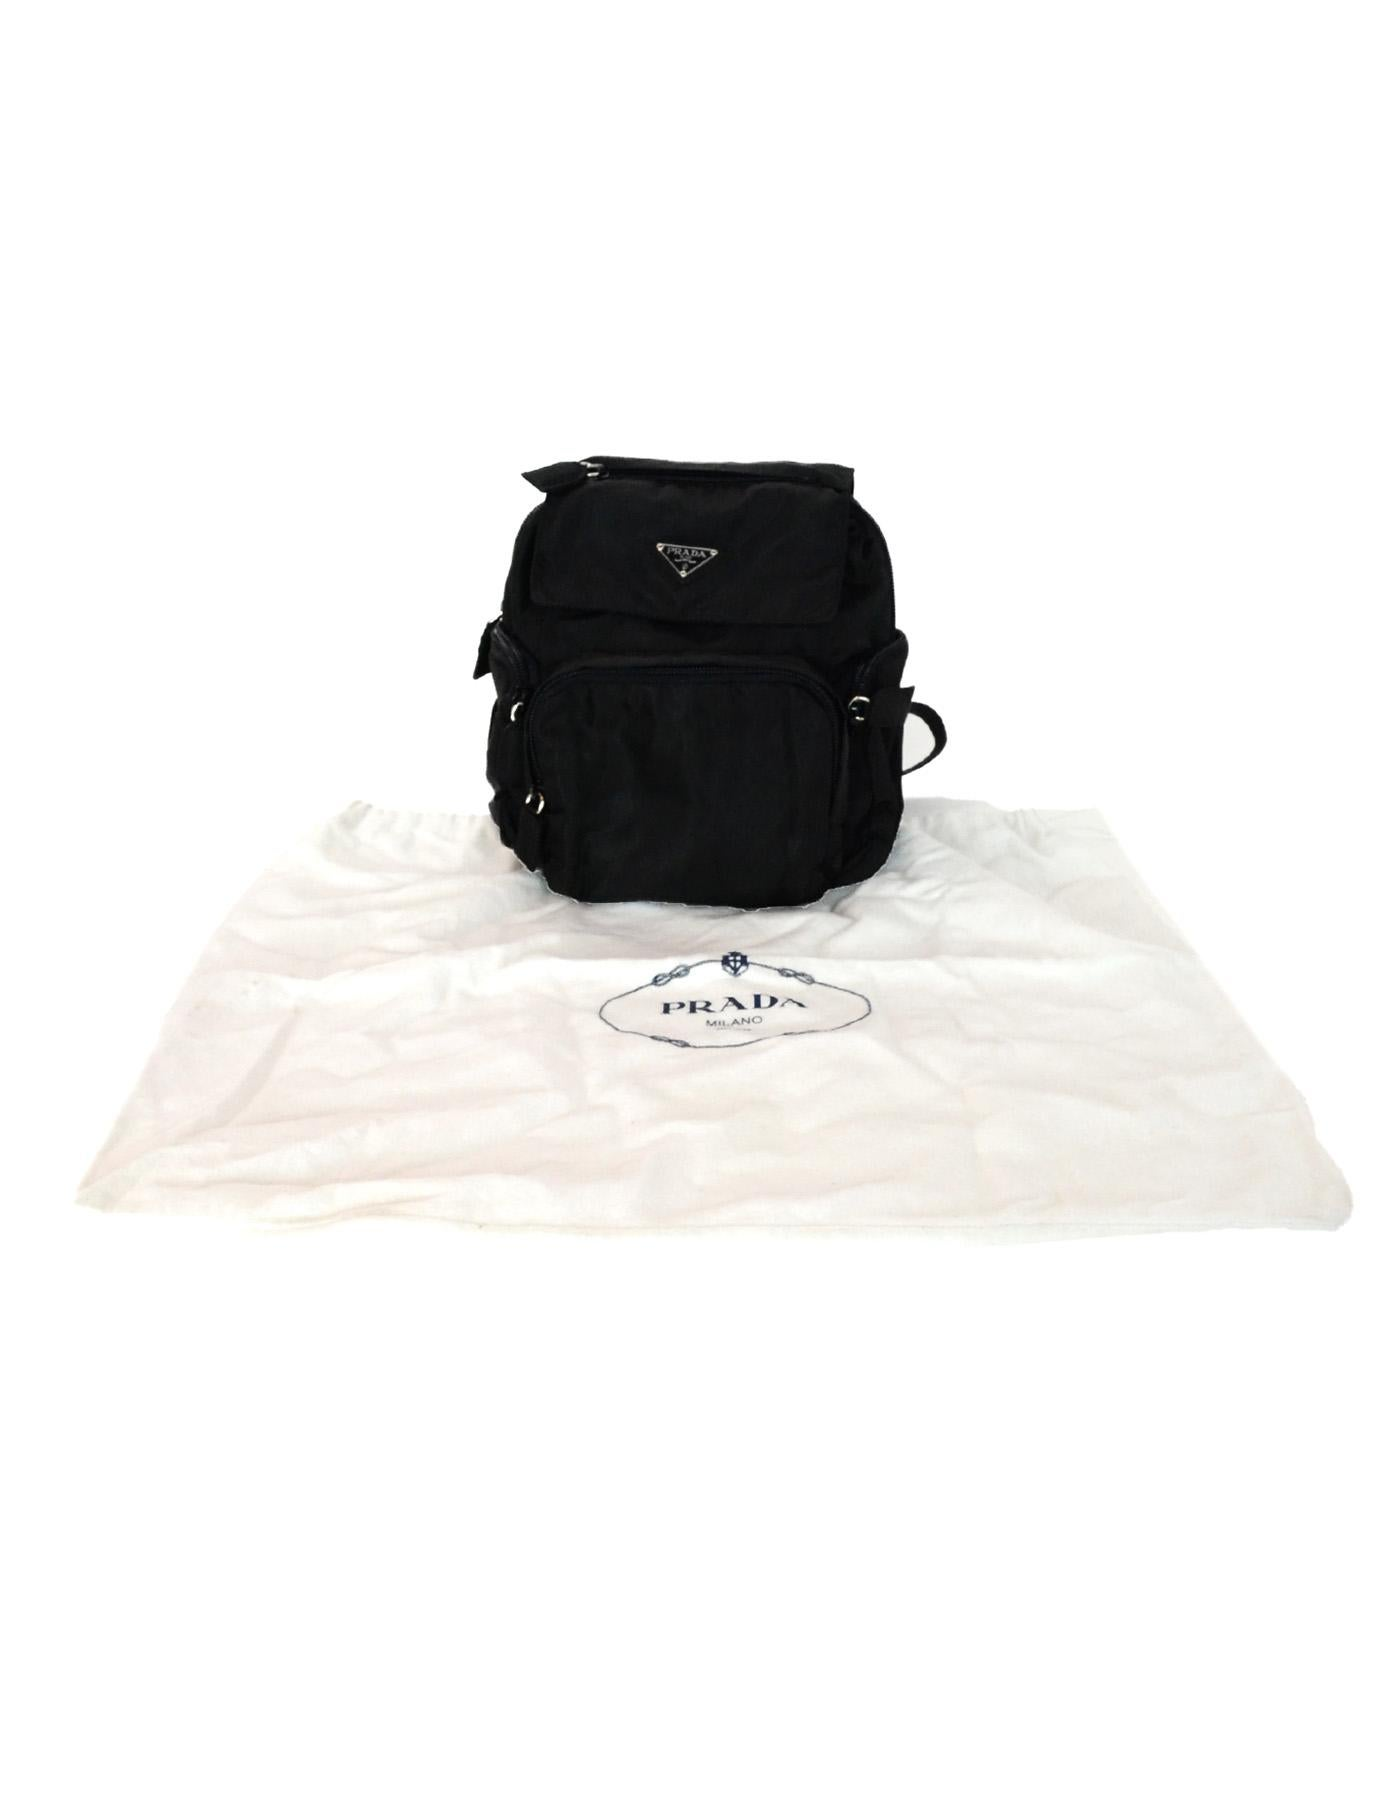 6fb33a6aa7d2 ... wholesale prada black nylon mini backpack bag w zip pockets for sale 5  47e8d 36ed1